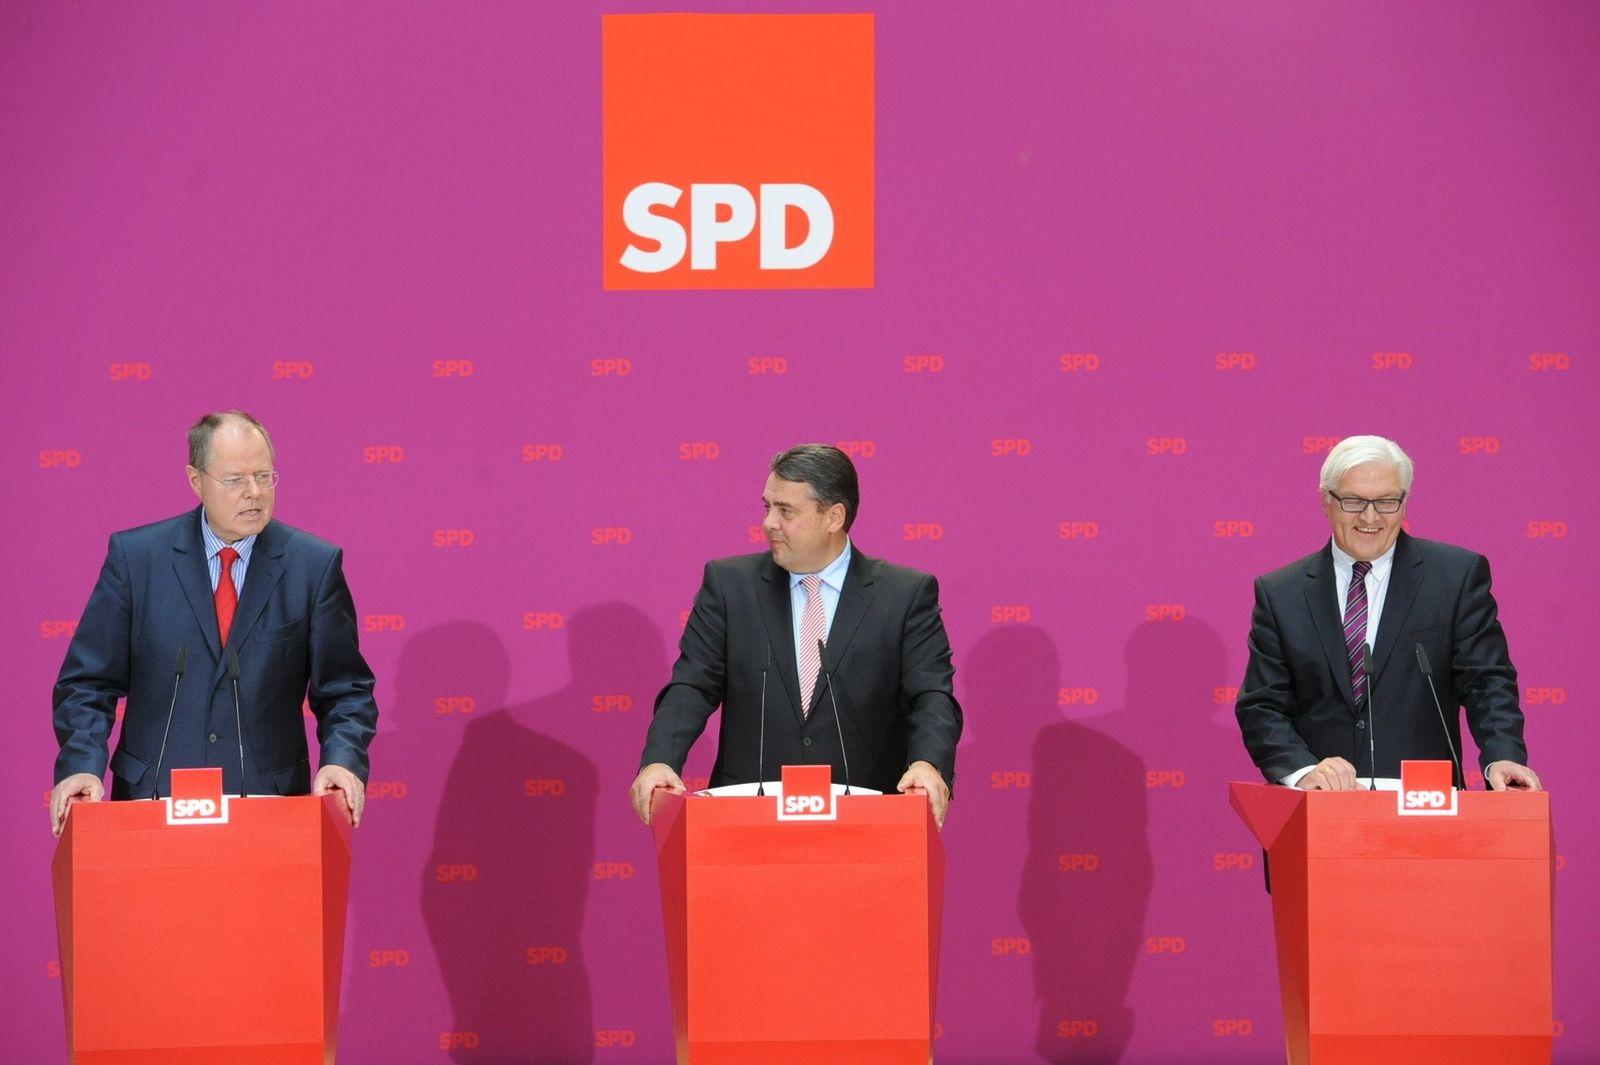 Steinbrück / Gabriel / Steinmeier / PK